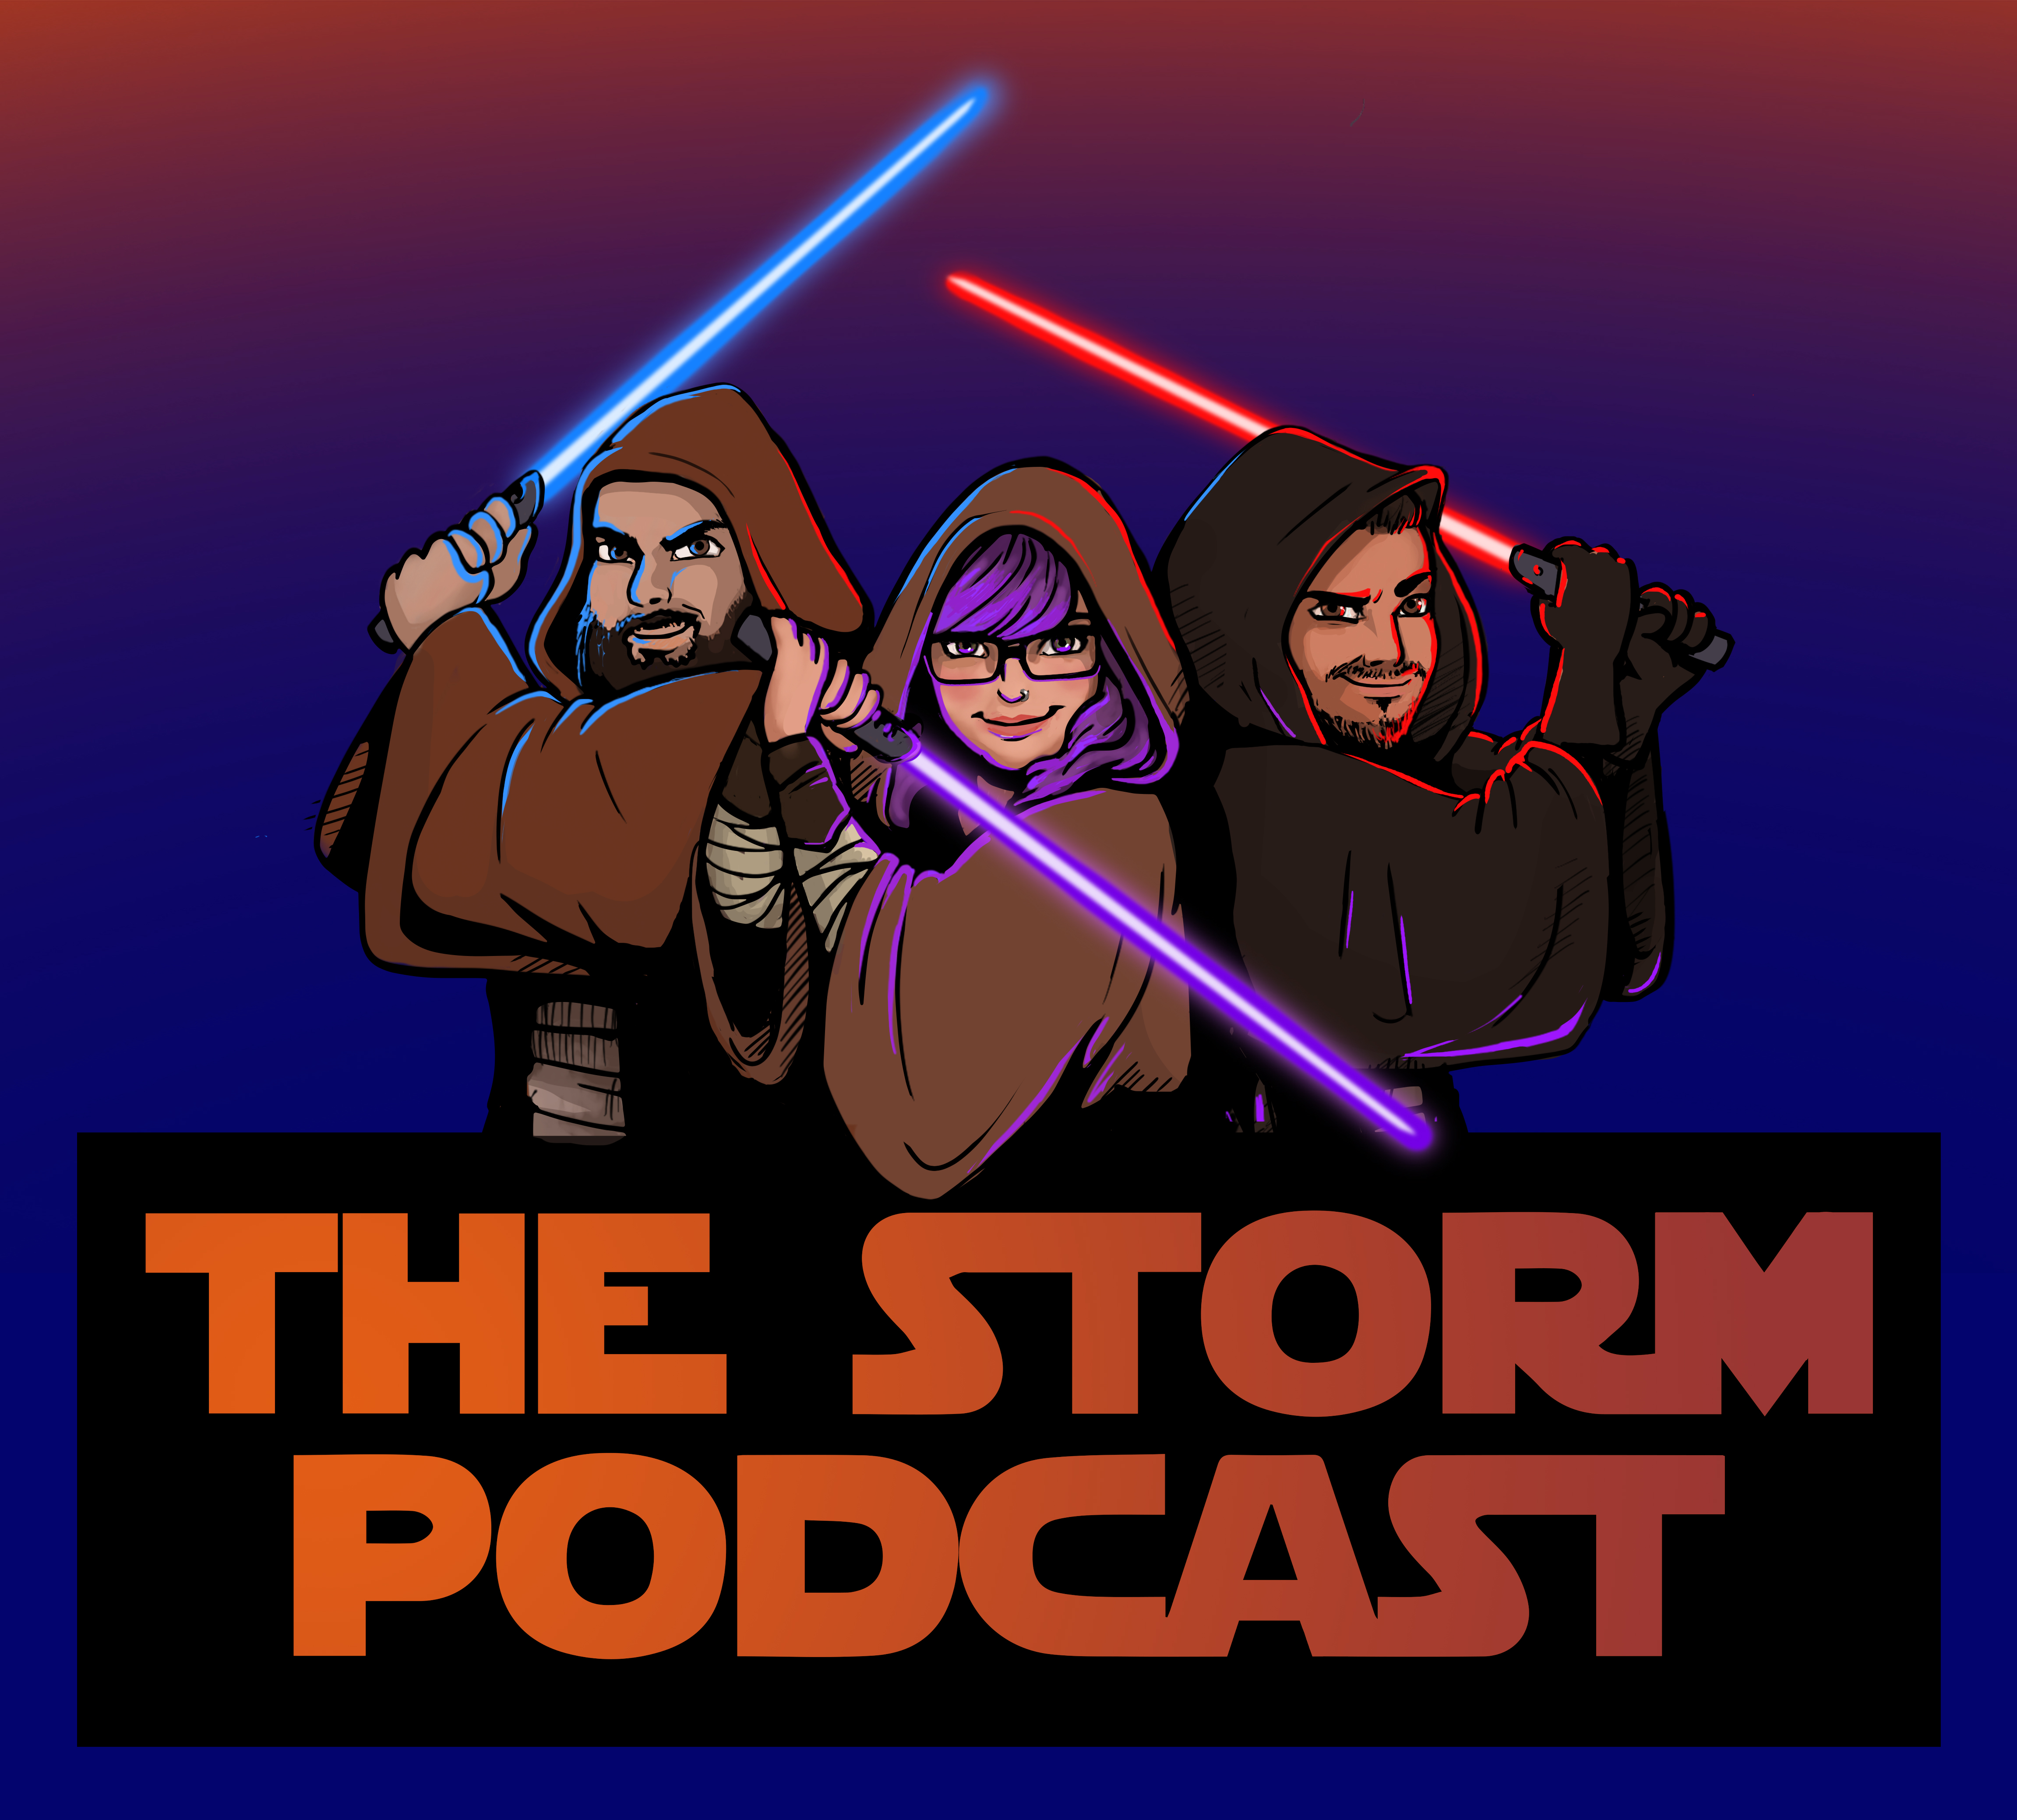 Storm Podcast Live Show!